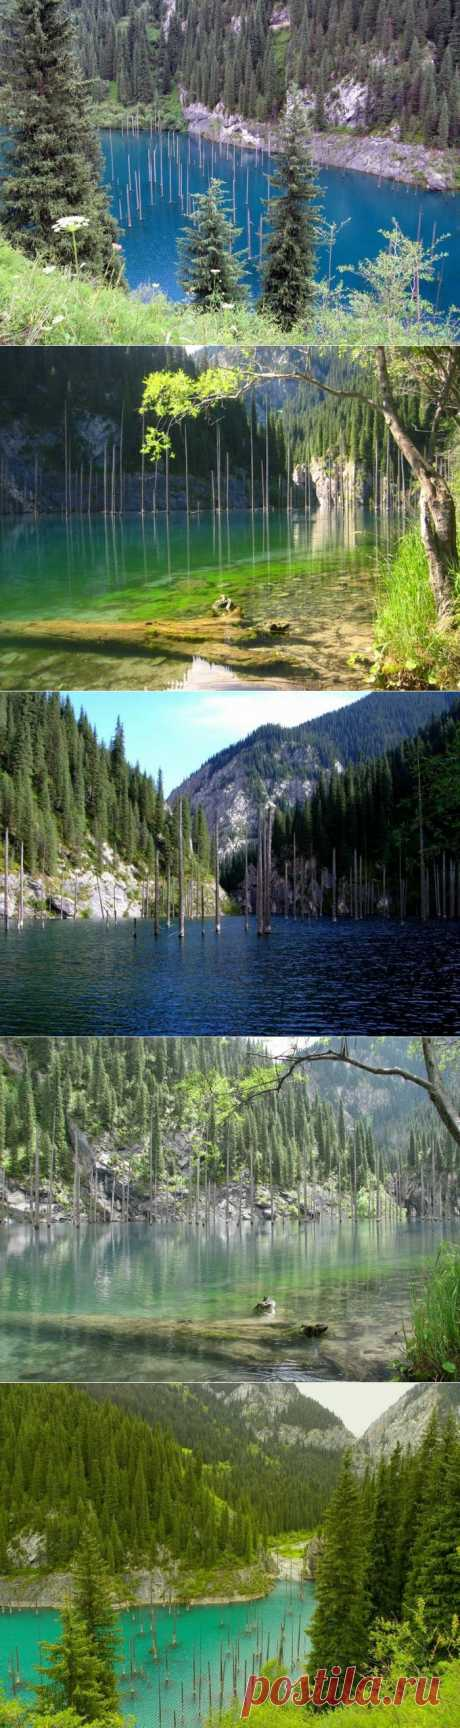 (+1) - Озеро Каинды. Казахстан | ТУРИЗМ И ОТДЫХ